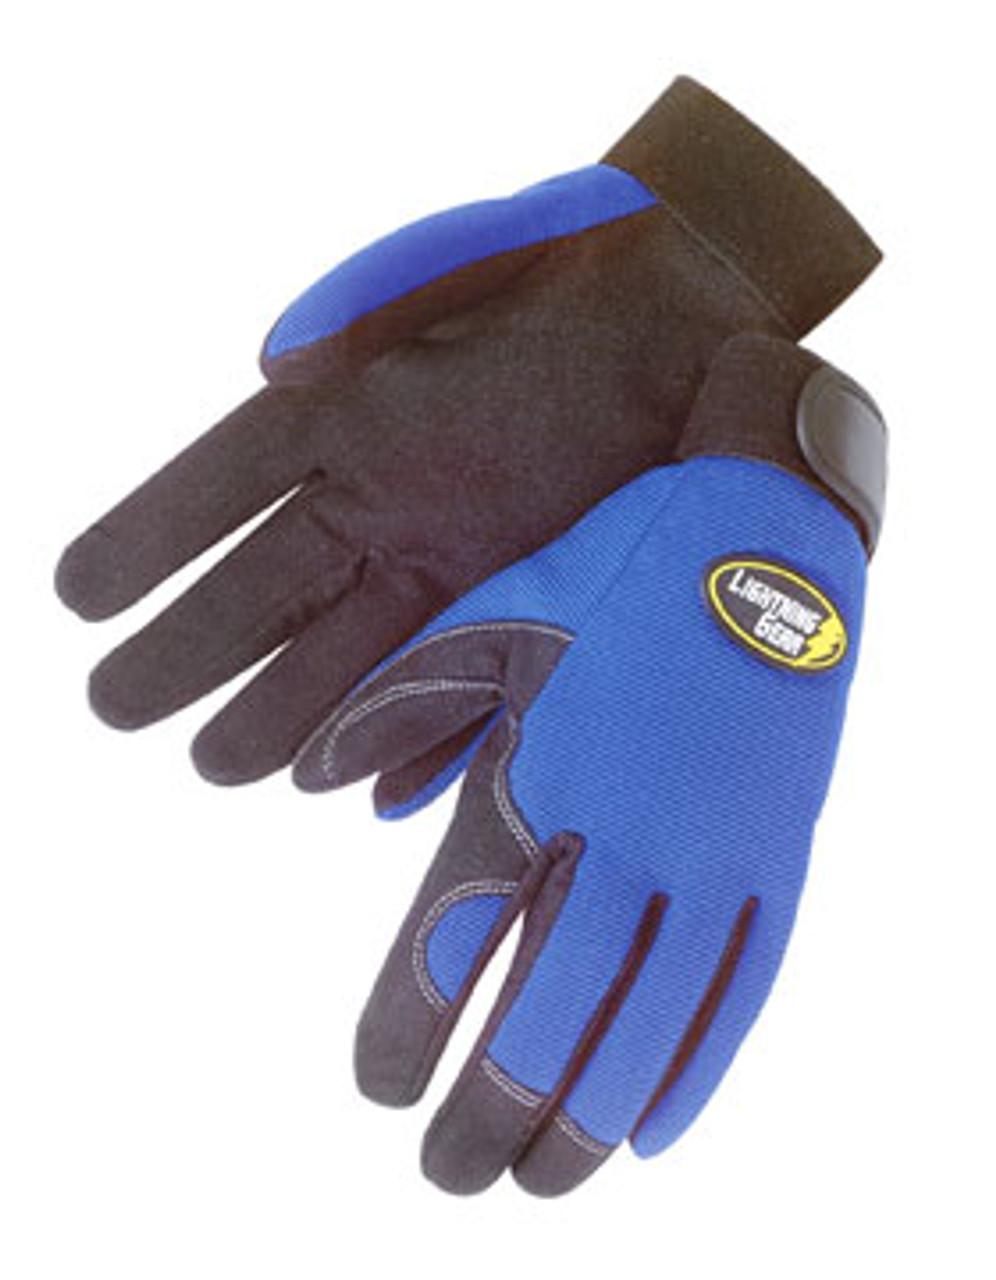 Blue Knight Glove